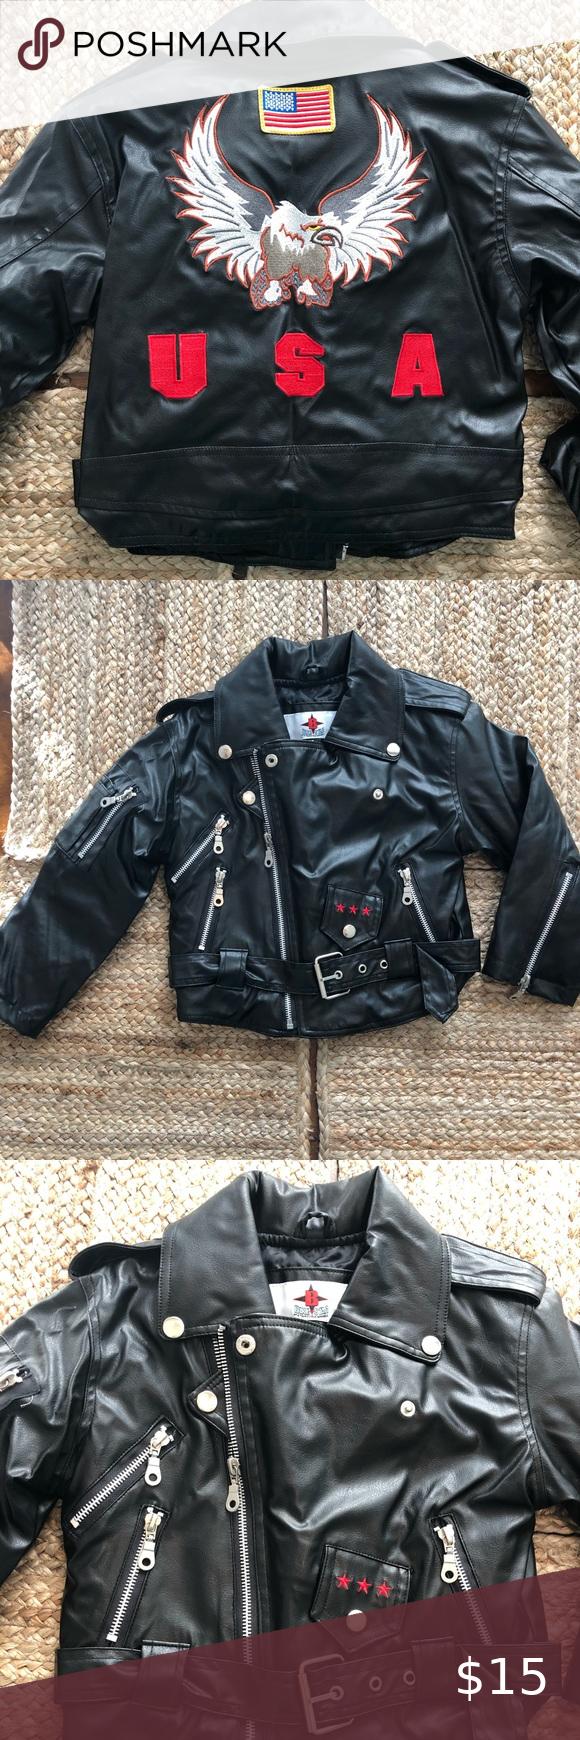 Bike Star Kid Leather Jacket Size 3t Kids Leather Jackets Leather Jacket Jackets [ 1740 x 580 Pixel ]